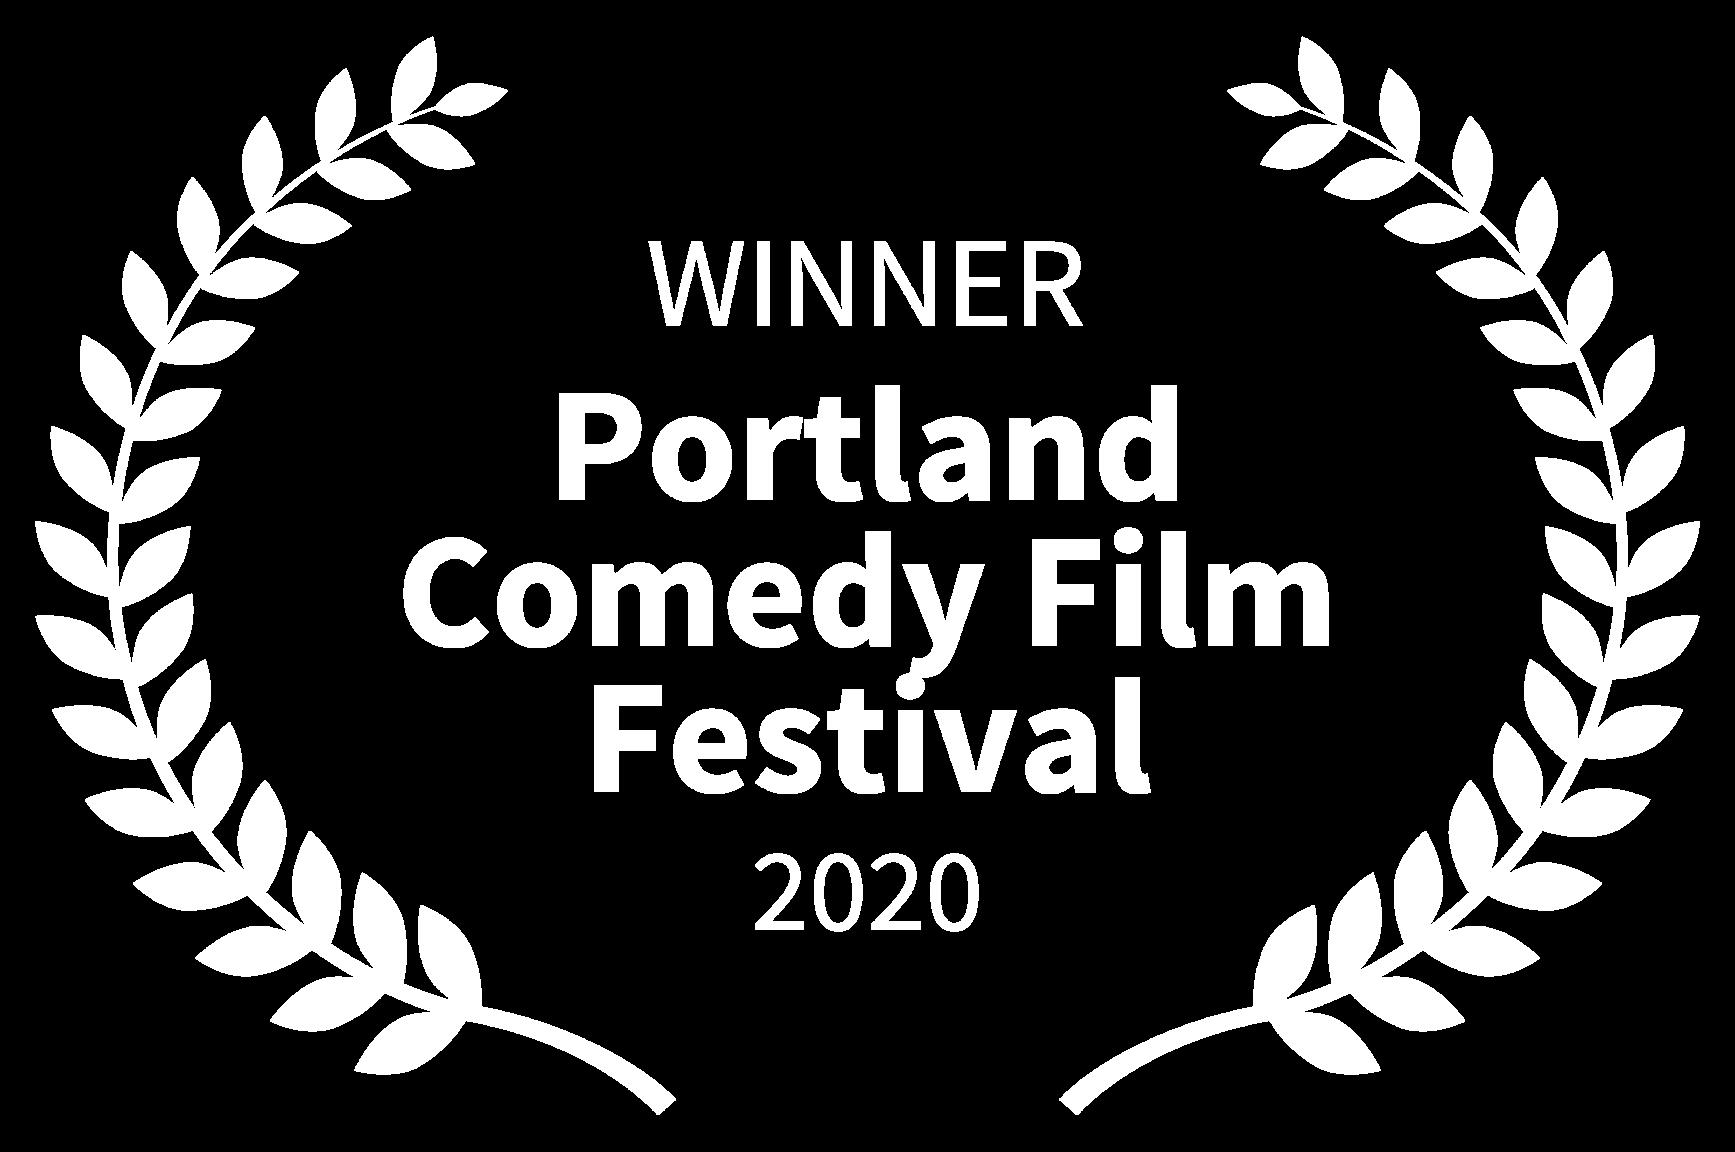 WINNER - Portland Comedy Film Festival - 2020